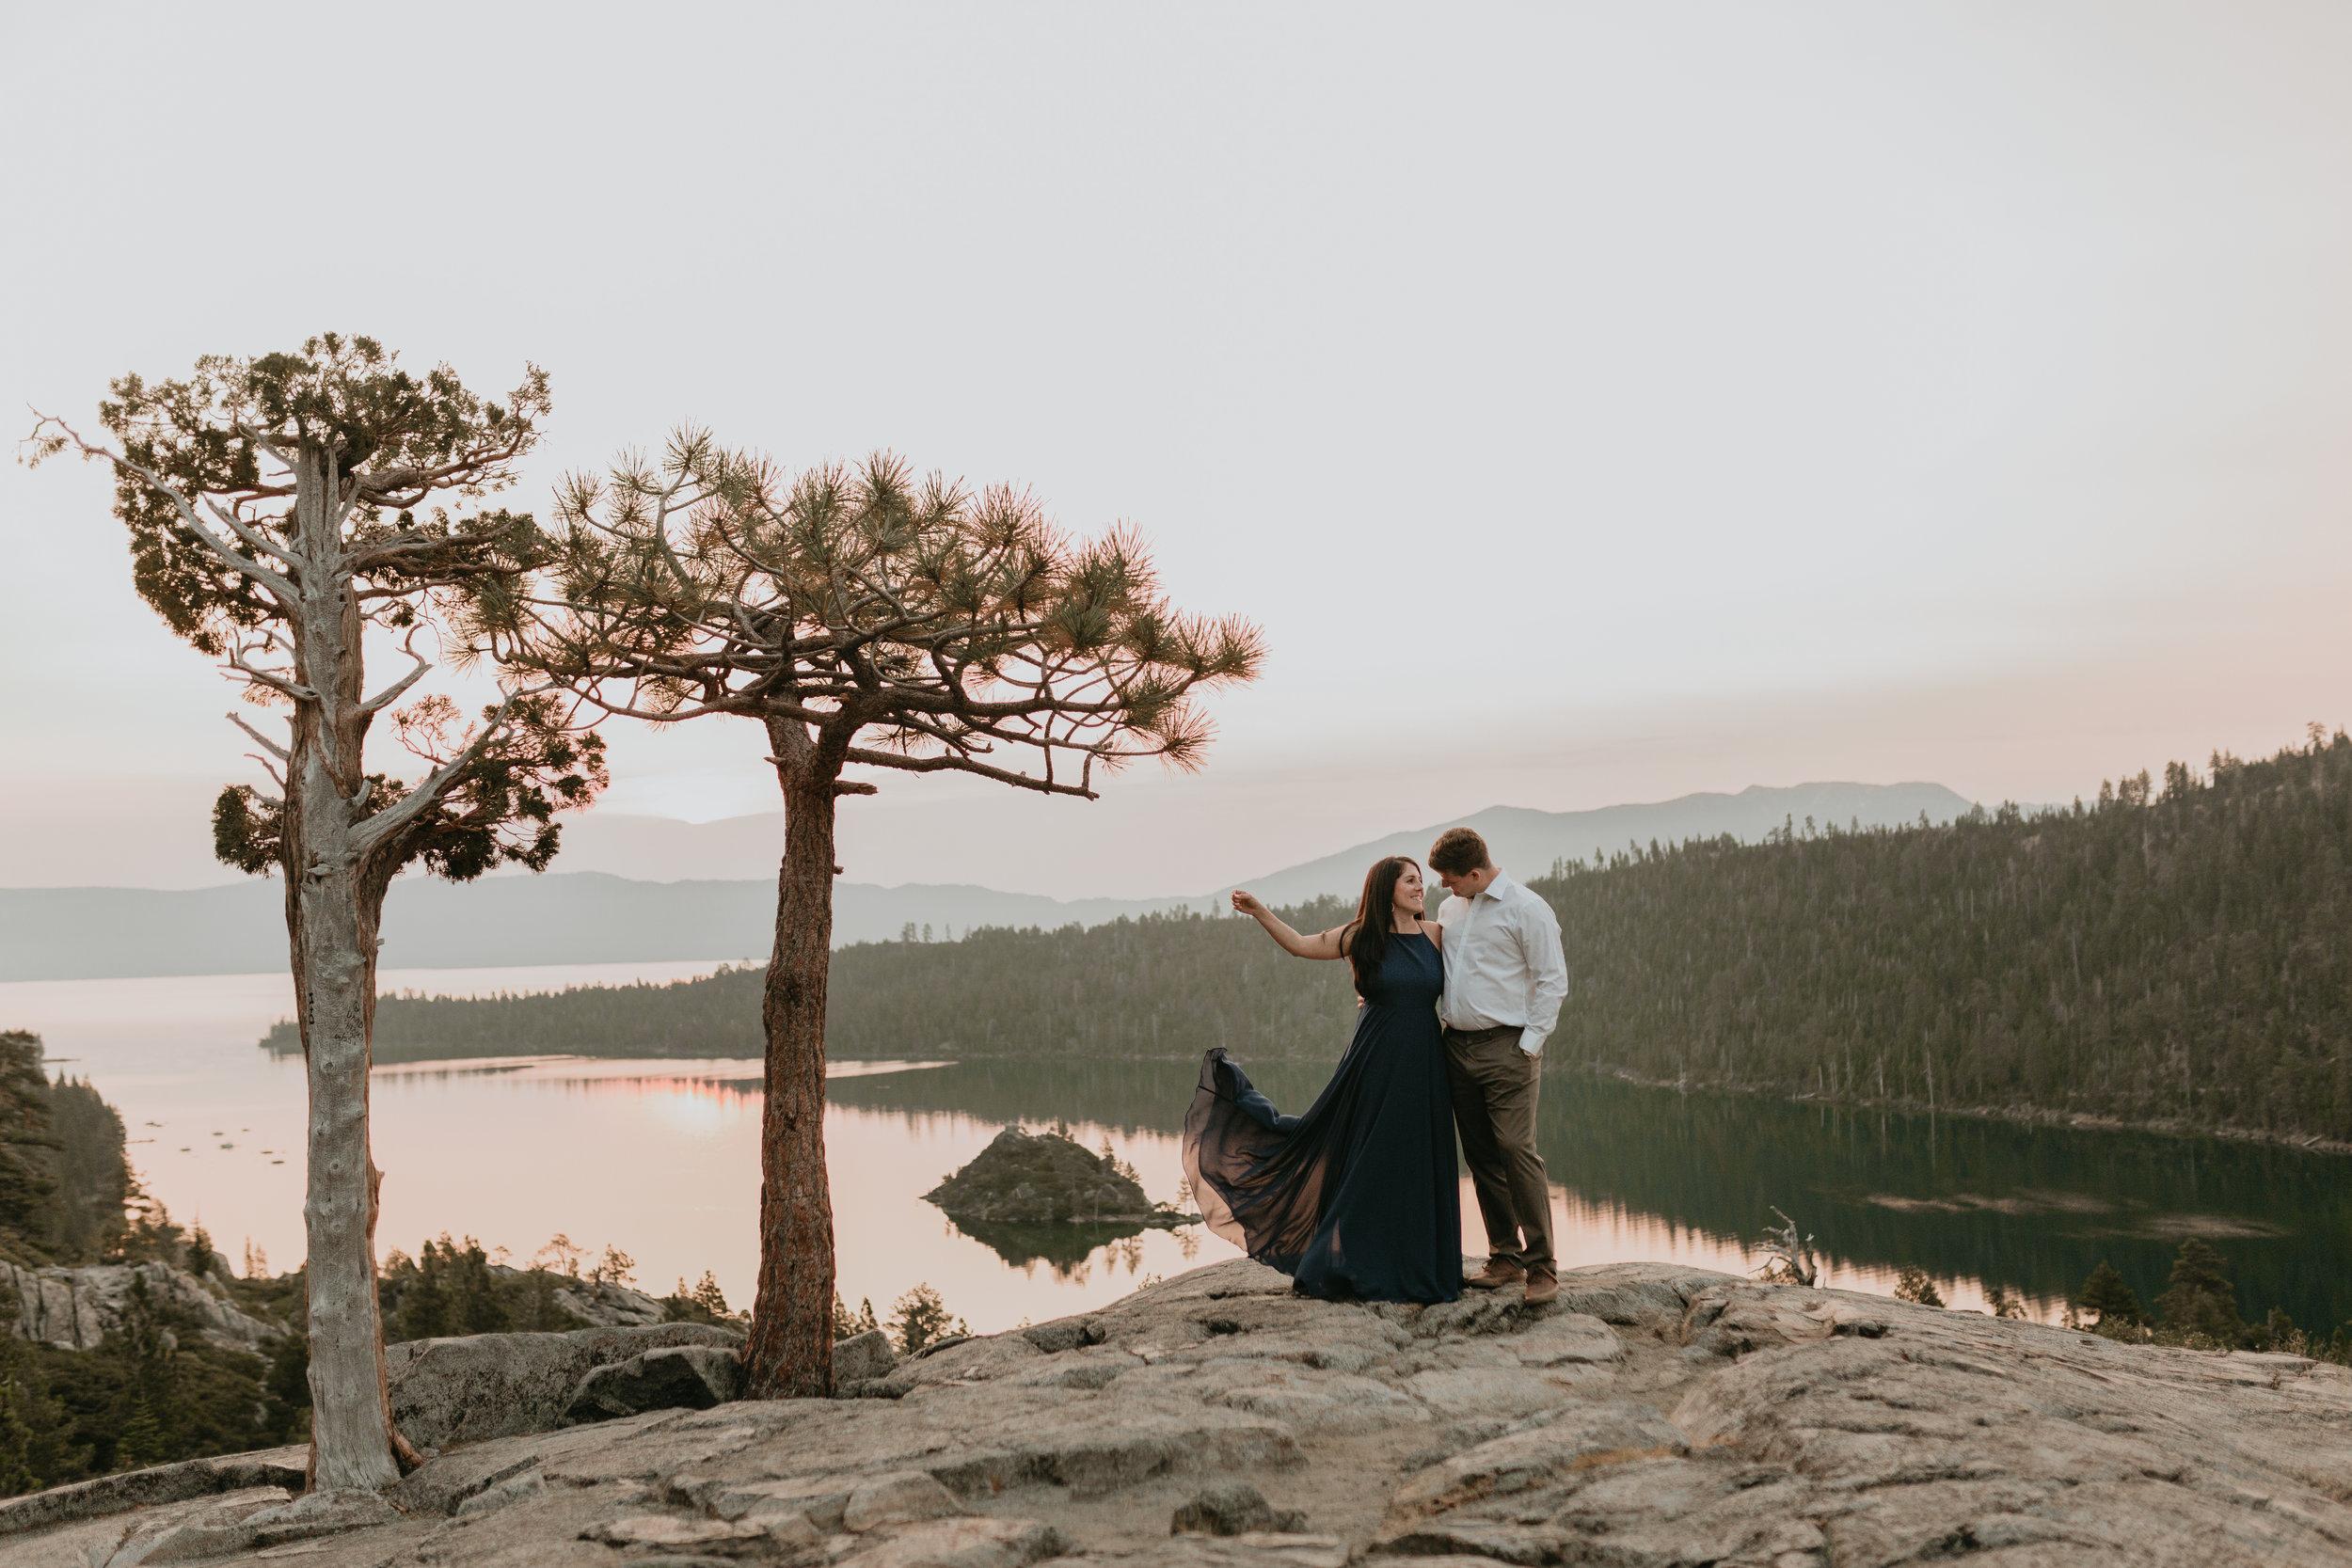 nicole-daacke-photography-lake-tahoe-sunrise-summer-adventure-engagement-photos-nevada-wedding-elopement-photographer-golden-emerald-bay-light-pine-trees-summer-vibe-fun-carefree-authentic-love-8.jpg